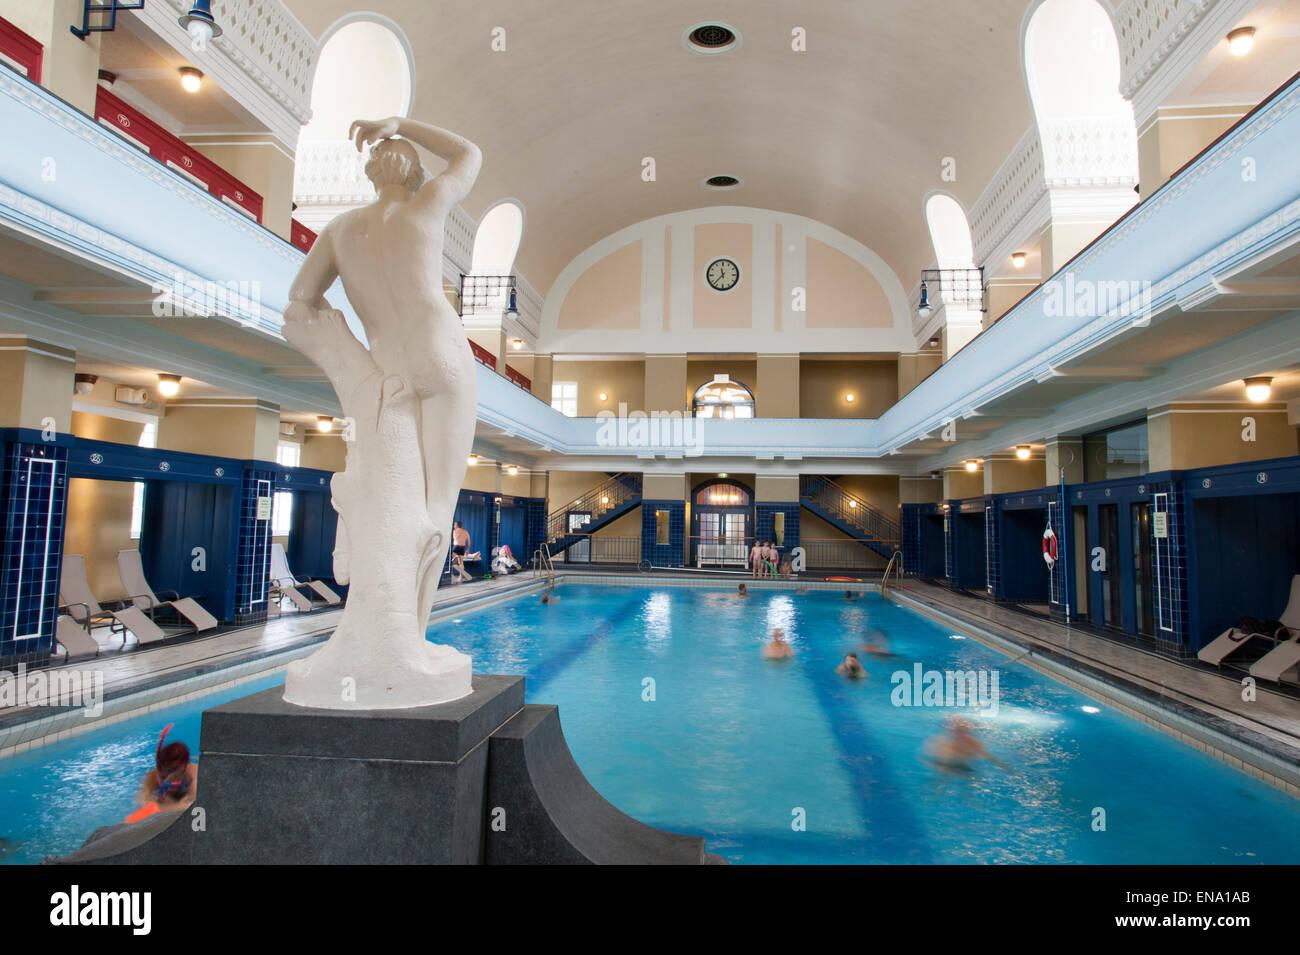 Schwimmbad Darmstadt nouveau indoor pool darmstadt germany jugendstilbad stock